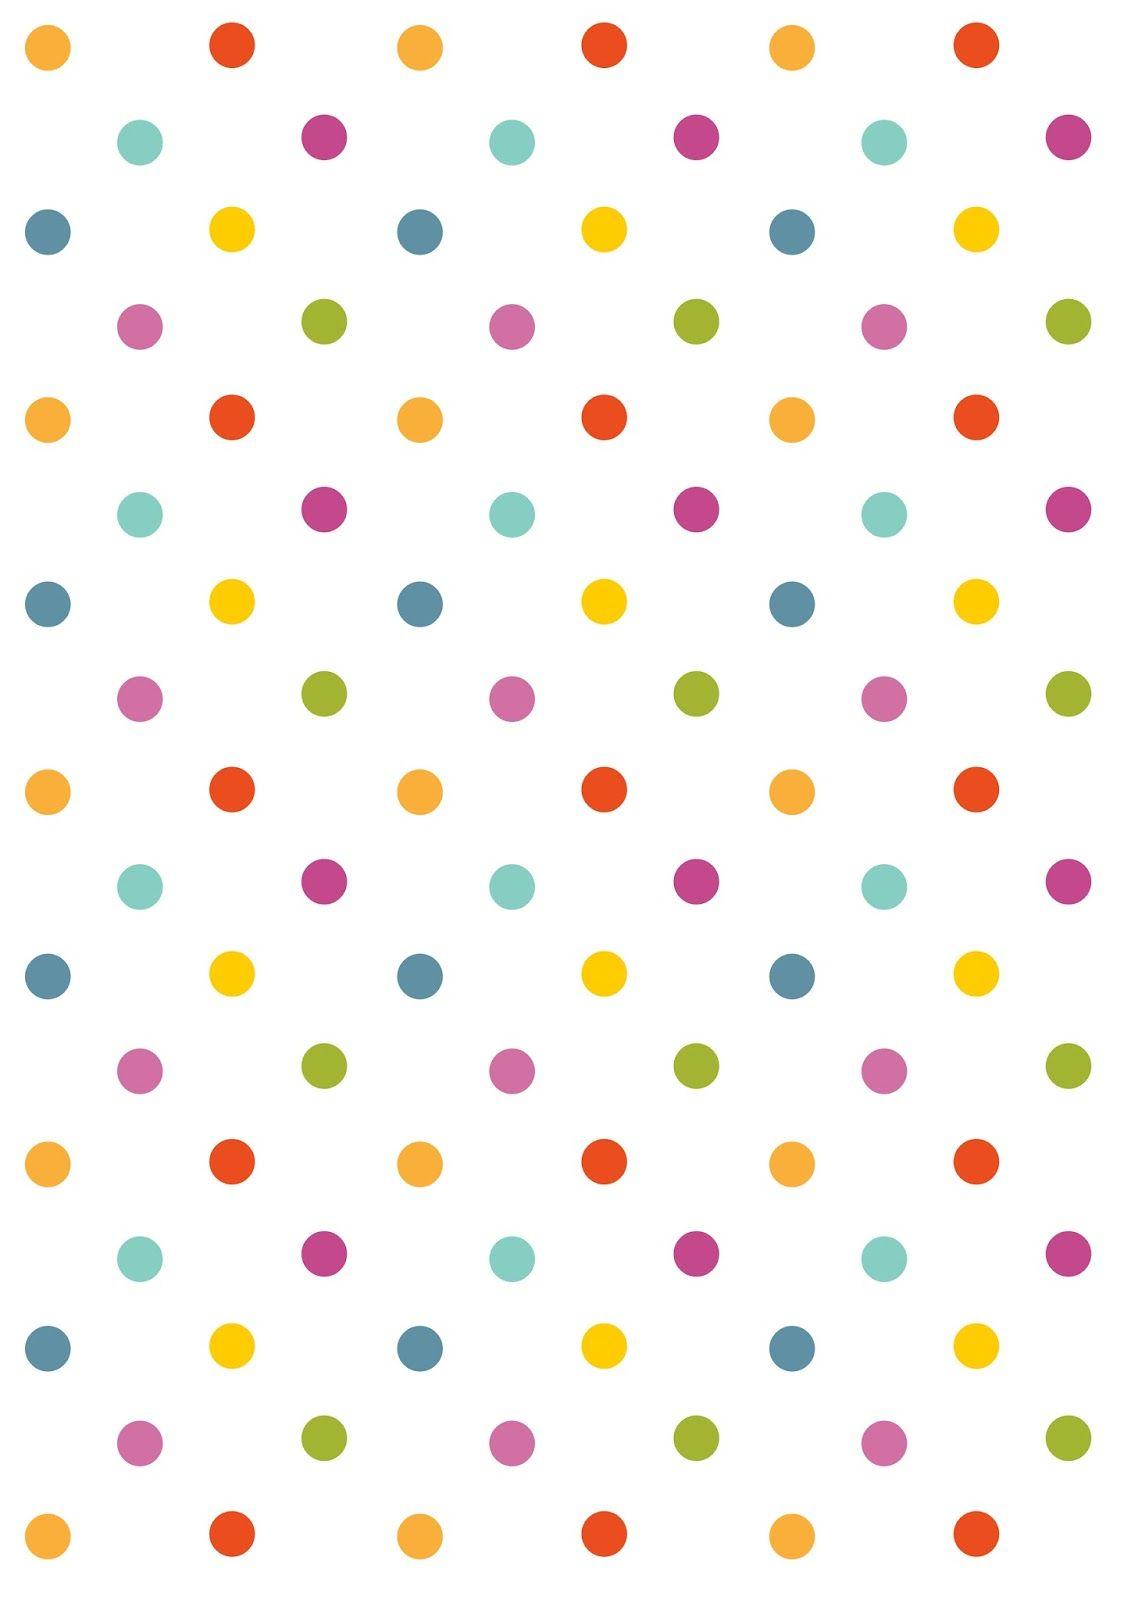 Free Polka Dot Background PNG - 153094